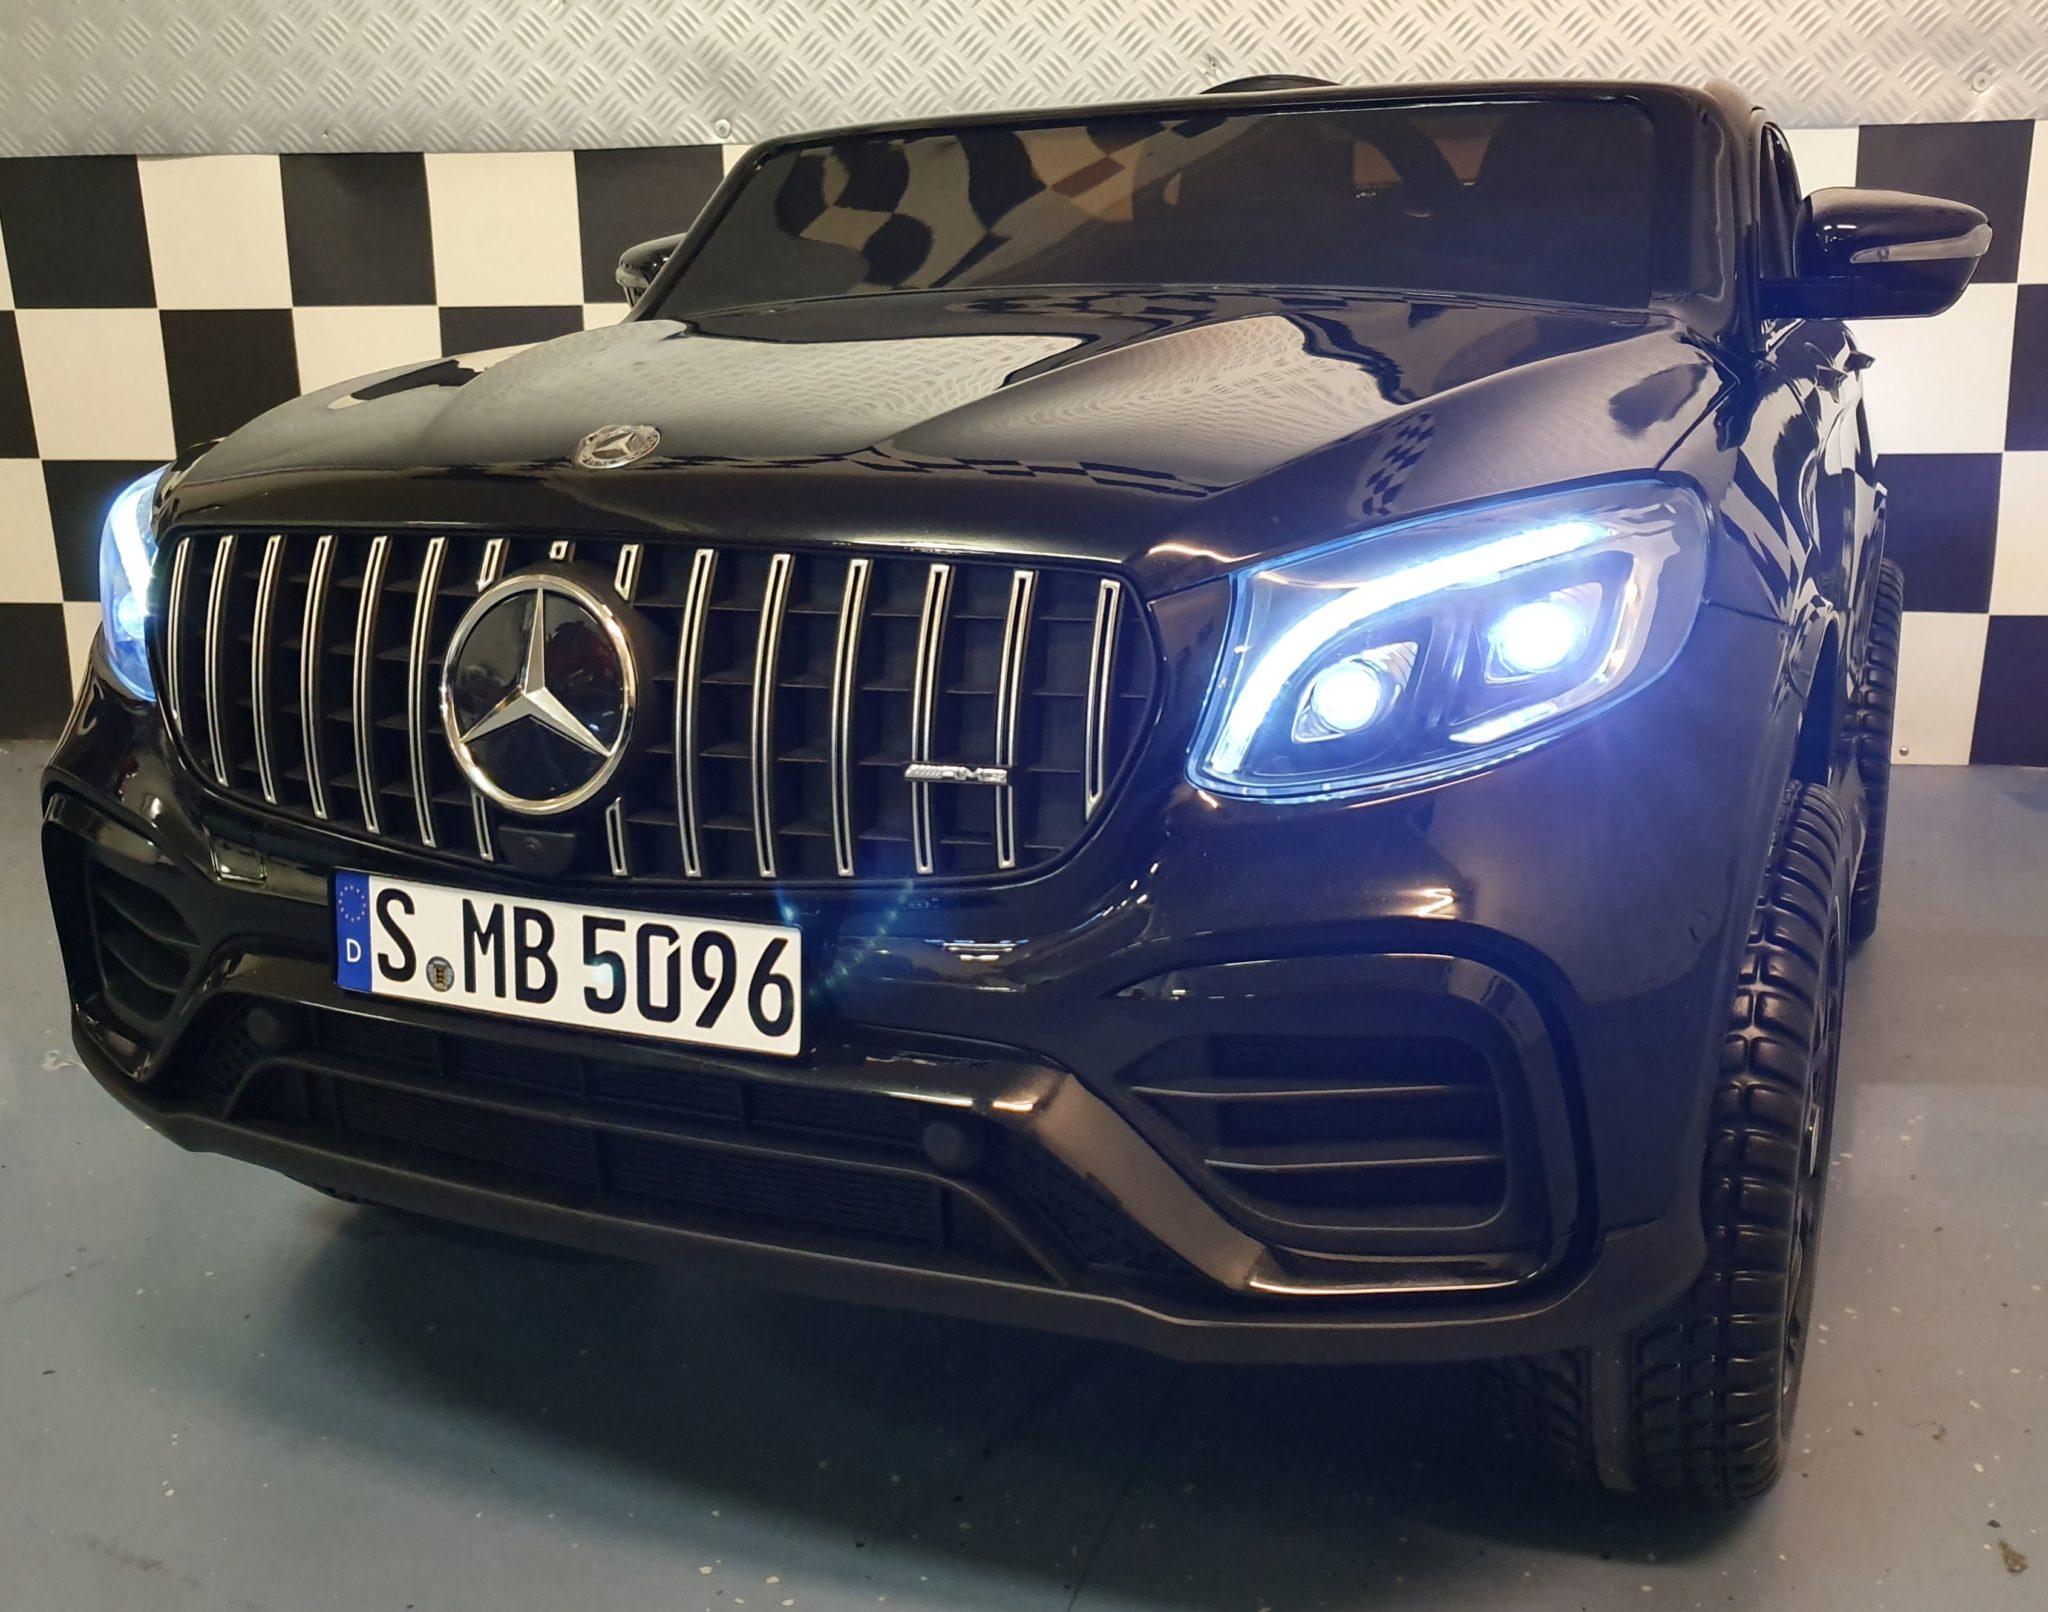 Elektrische auto kind Mercedes GLC63 2 persoons metallic zwart